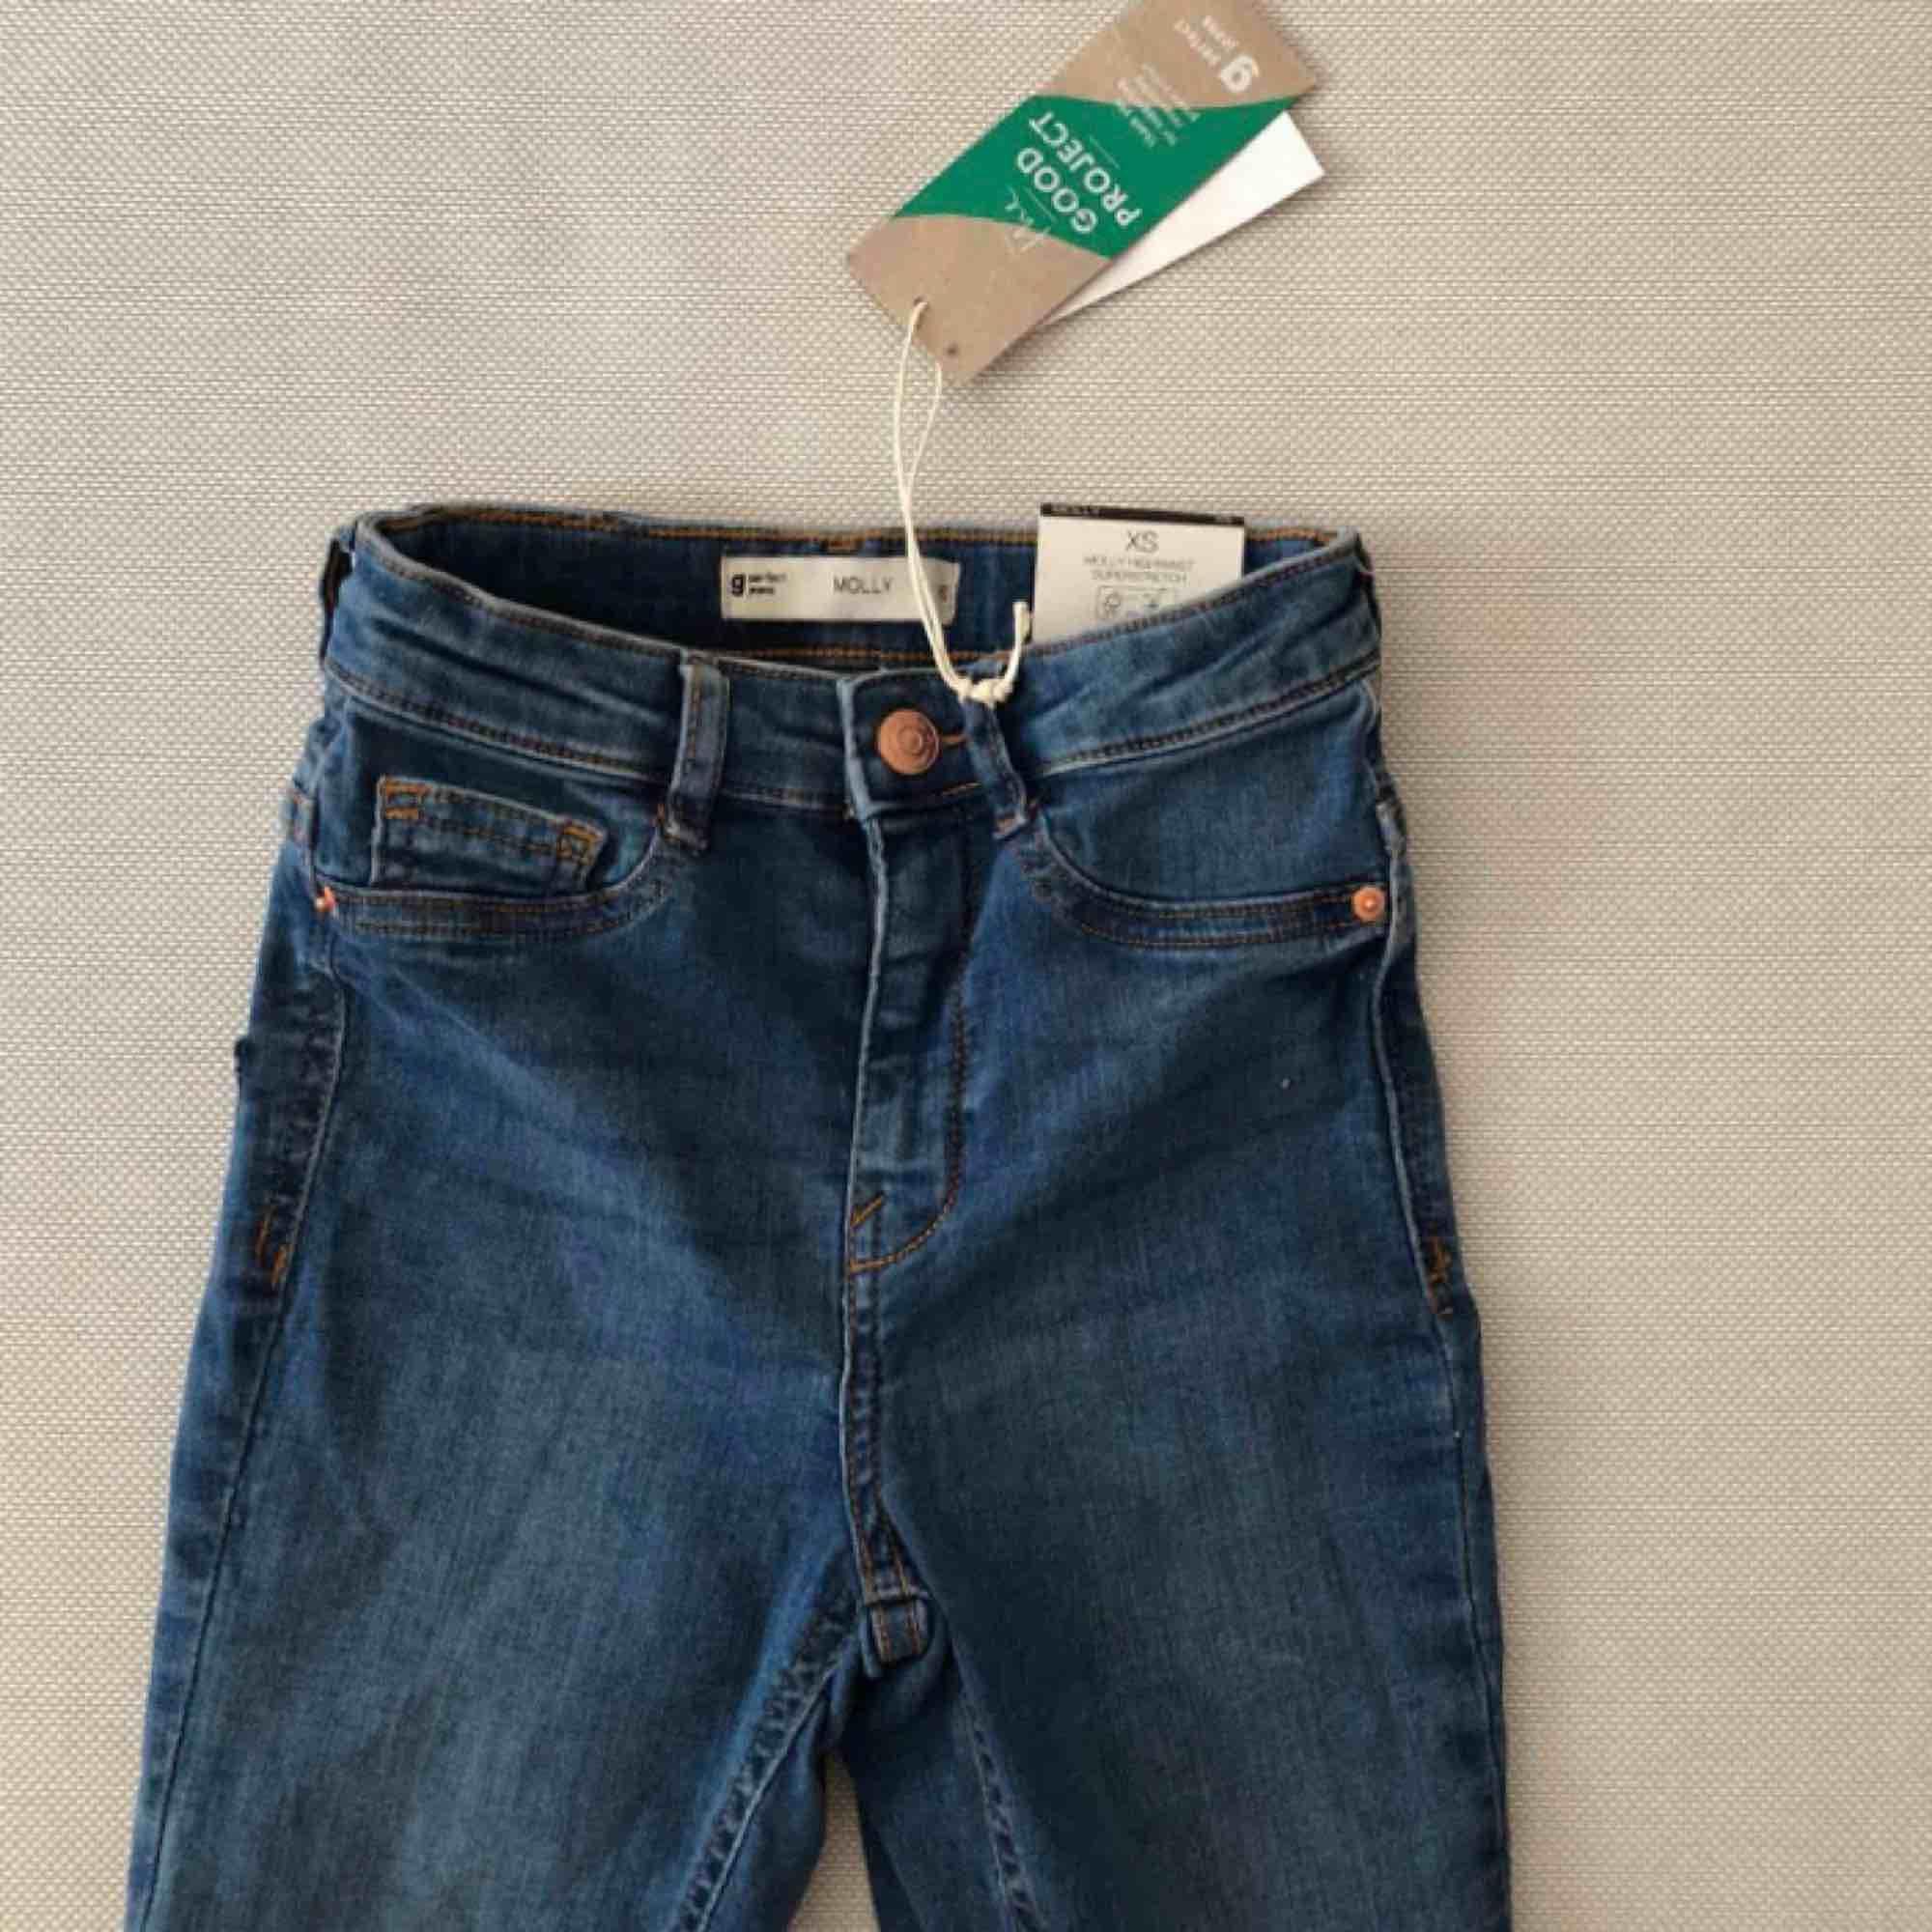 Jeans från Gina Tricot, nya med tags kvar. . Jeans & Byxor.